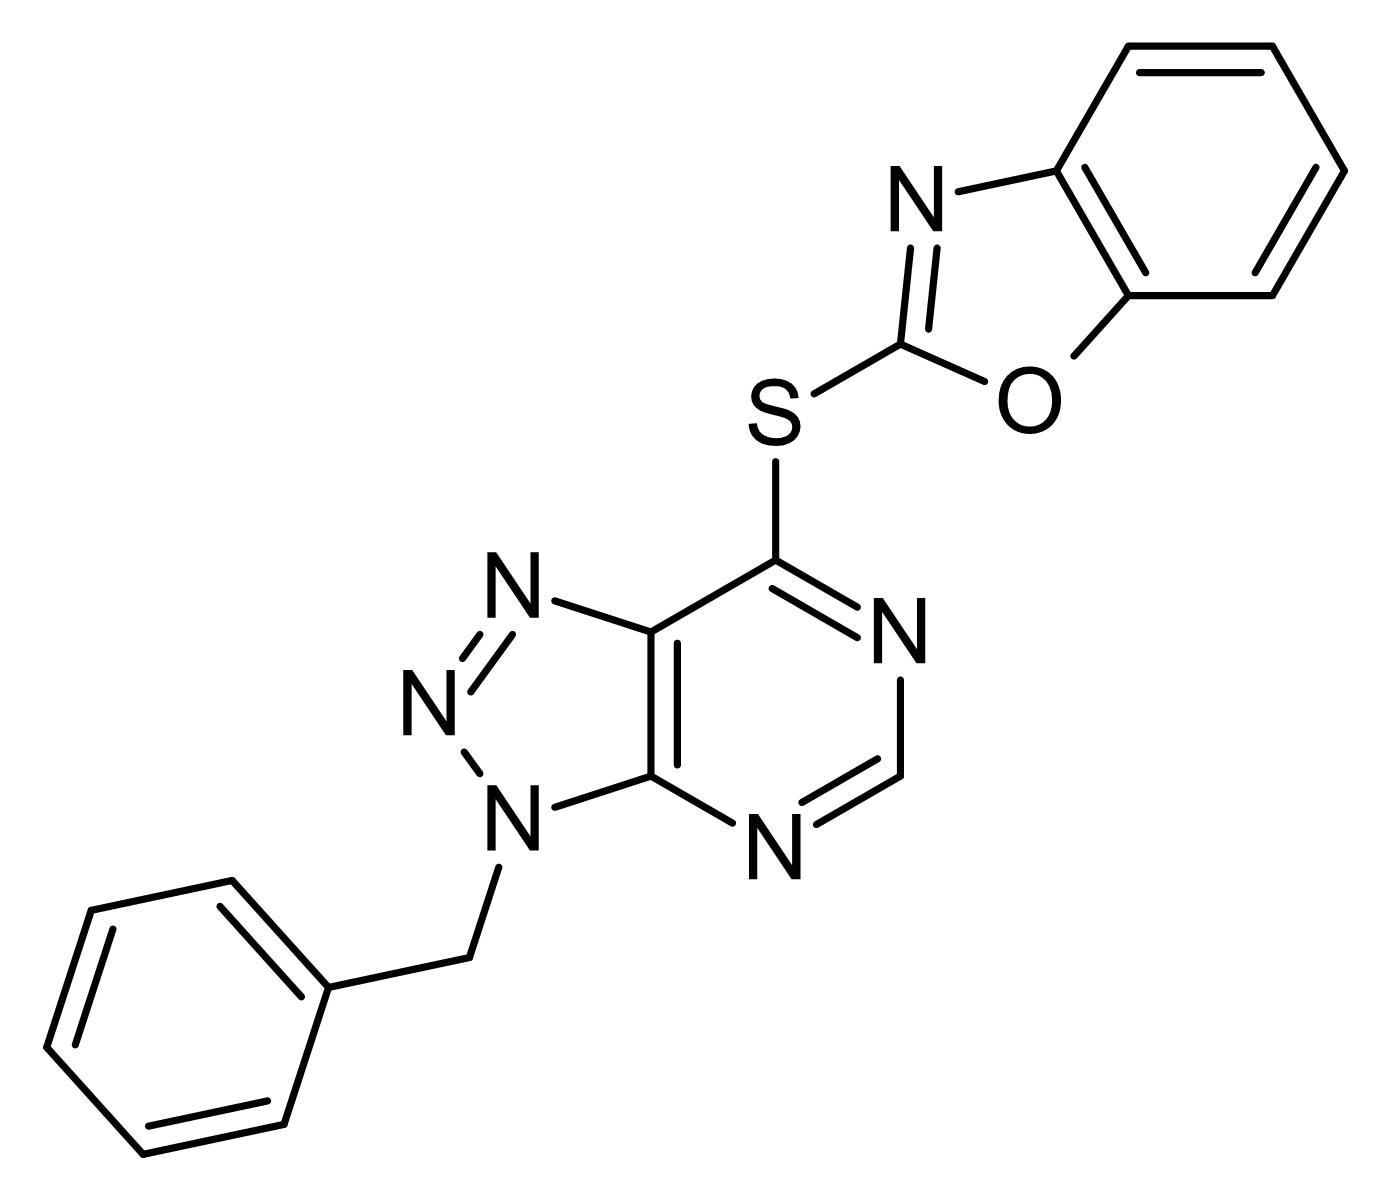 Chemical Structure - VAS 2870, NADPH oxidase inhibitor (ab145209)